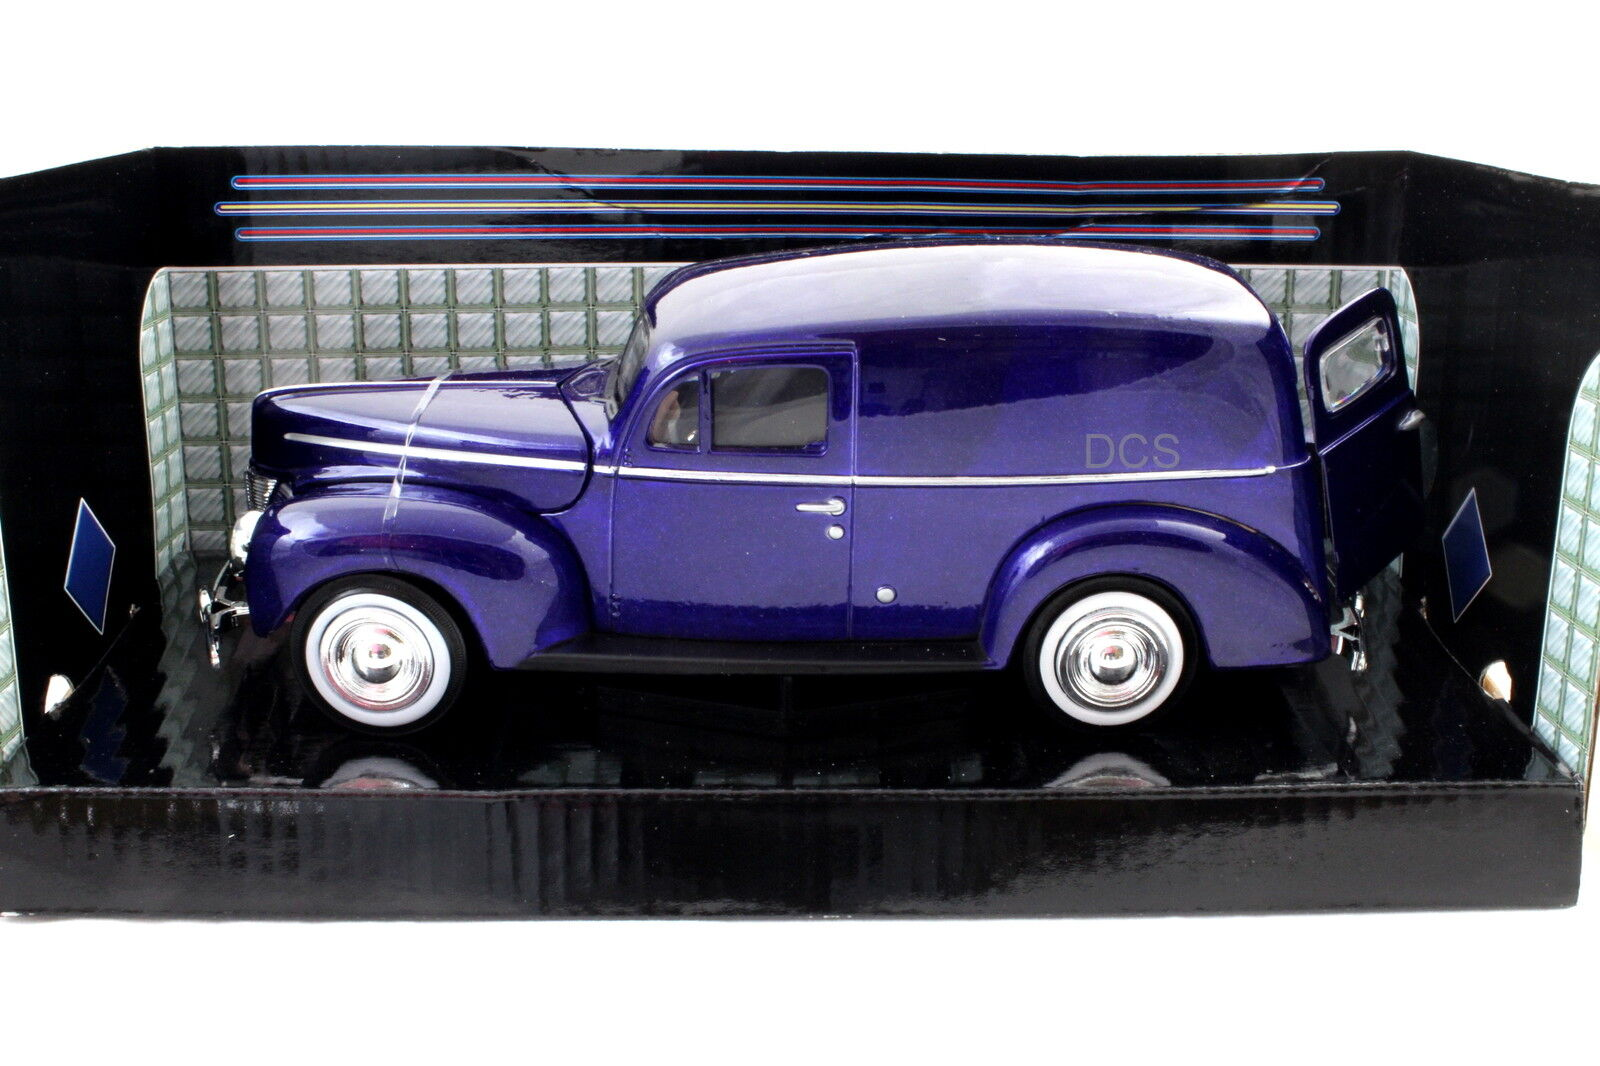 Motormax 1940 Ford Sedan Entrega azul 1 24 24 24 de Metal Cars 70918d